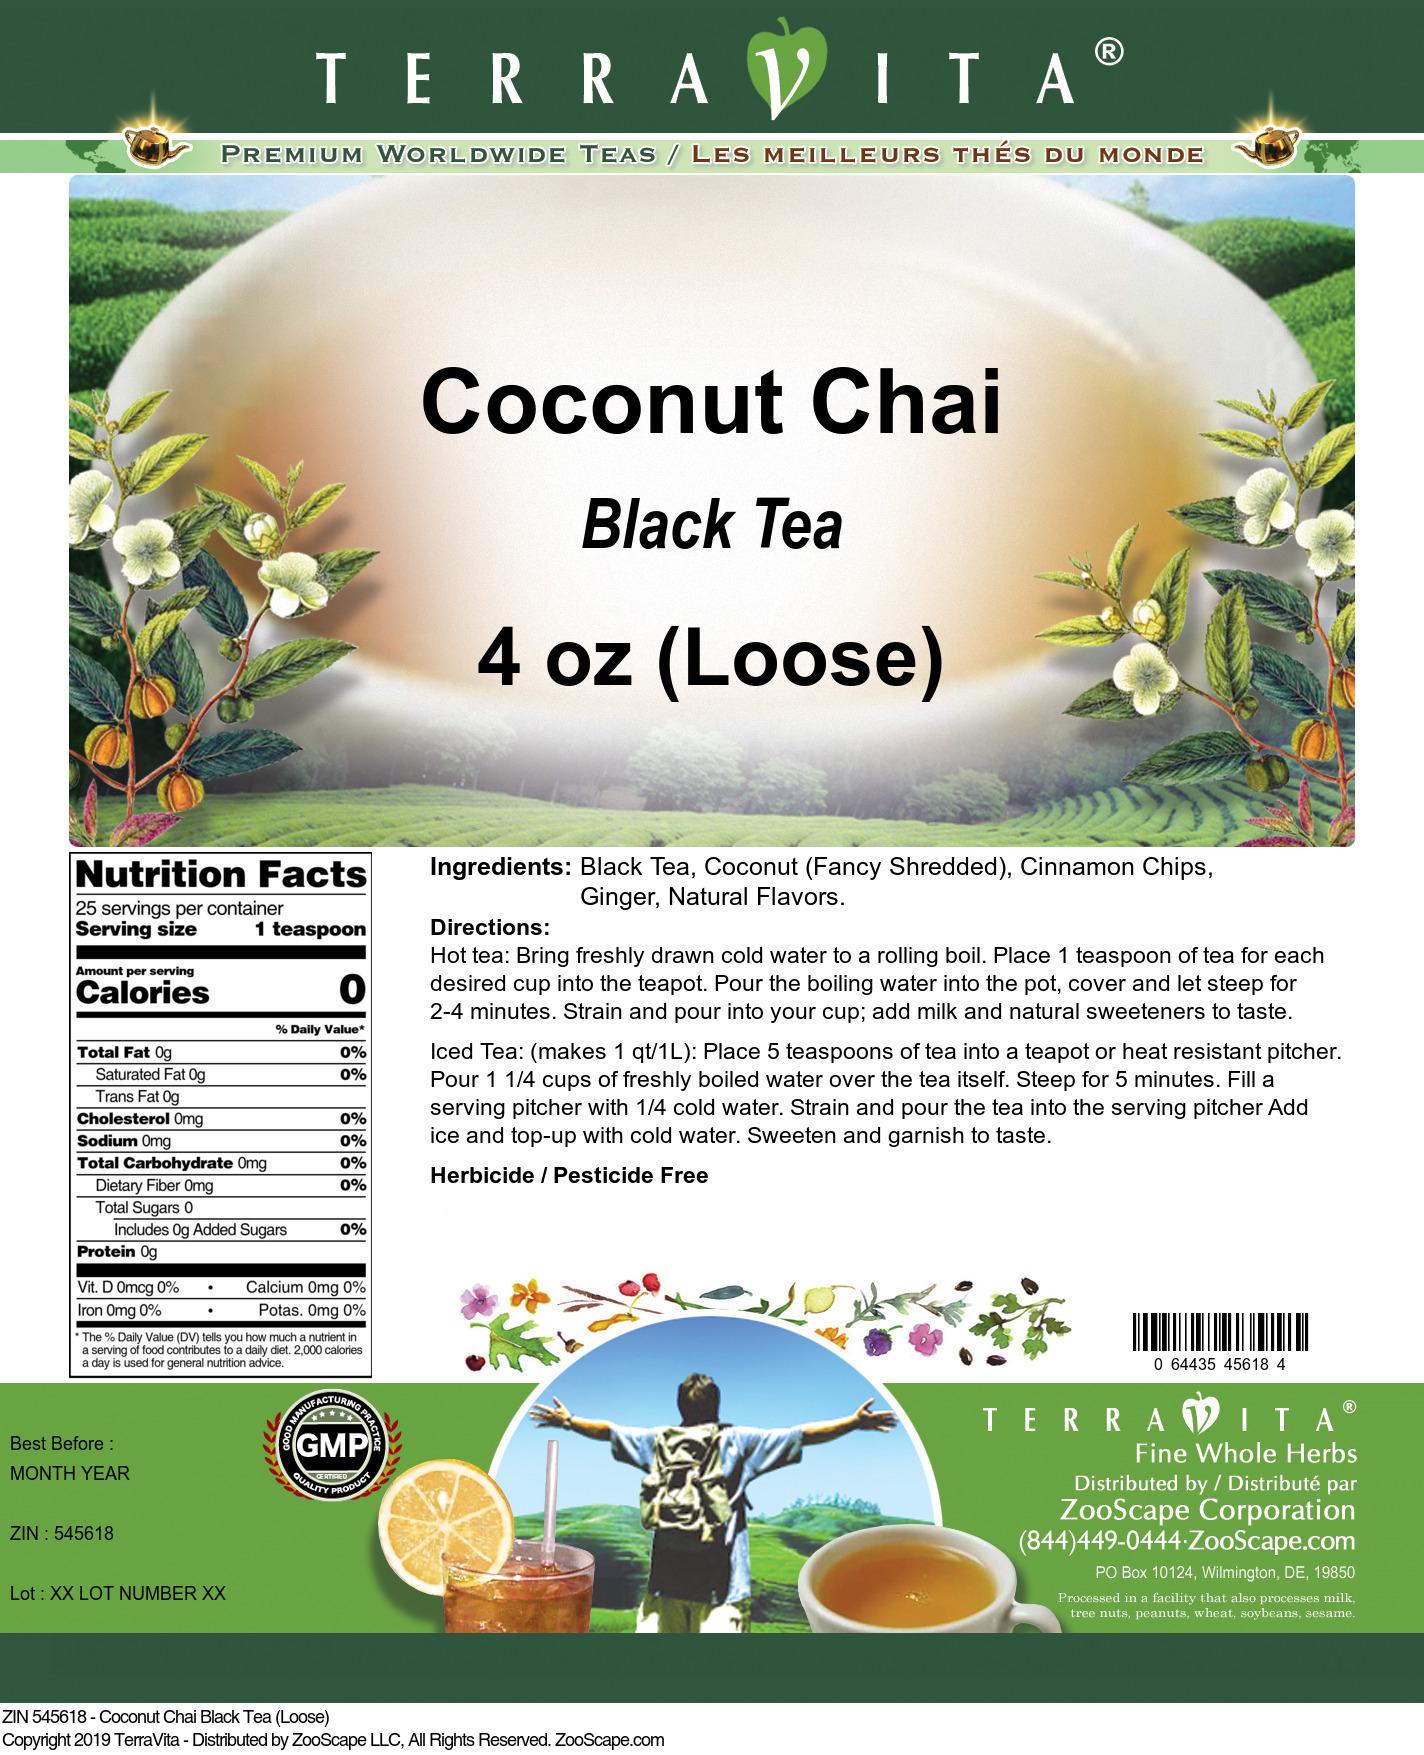 Coconut Chai Black Tea (Loose)